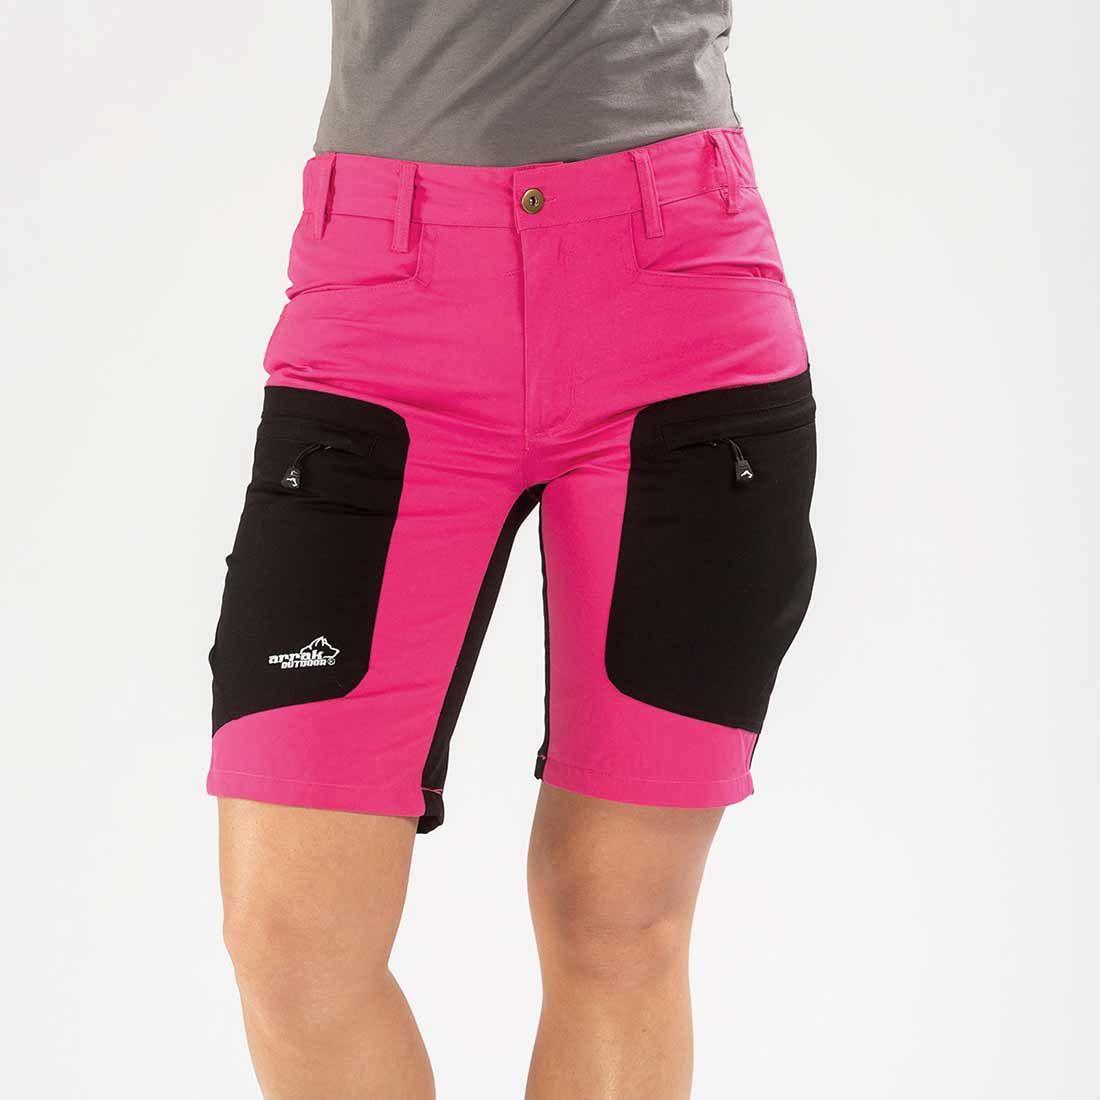 Arrak Active stretch Shorts LADY Pink 44